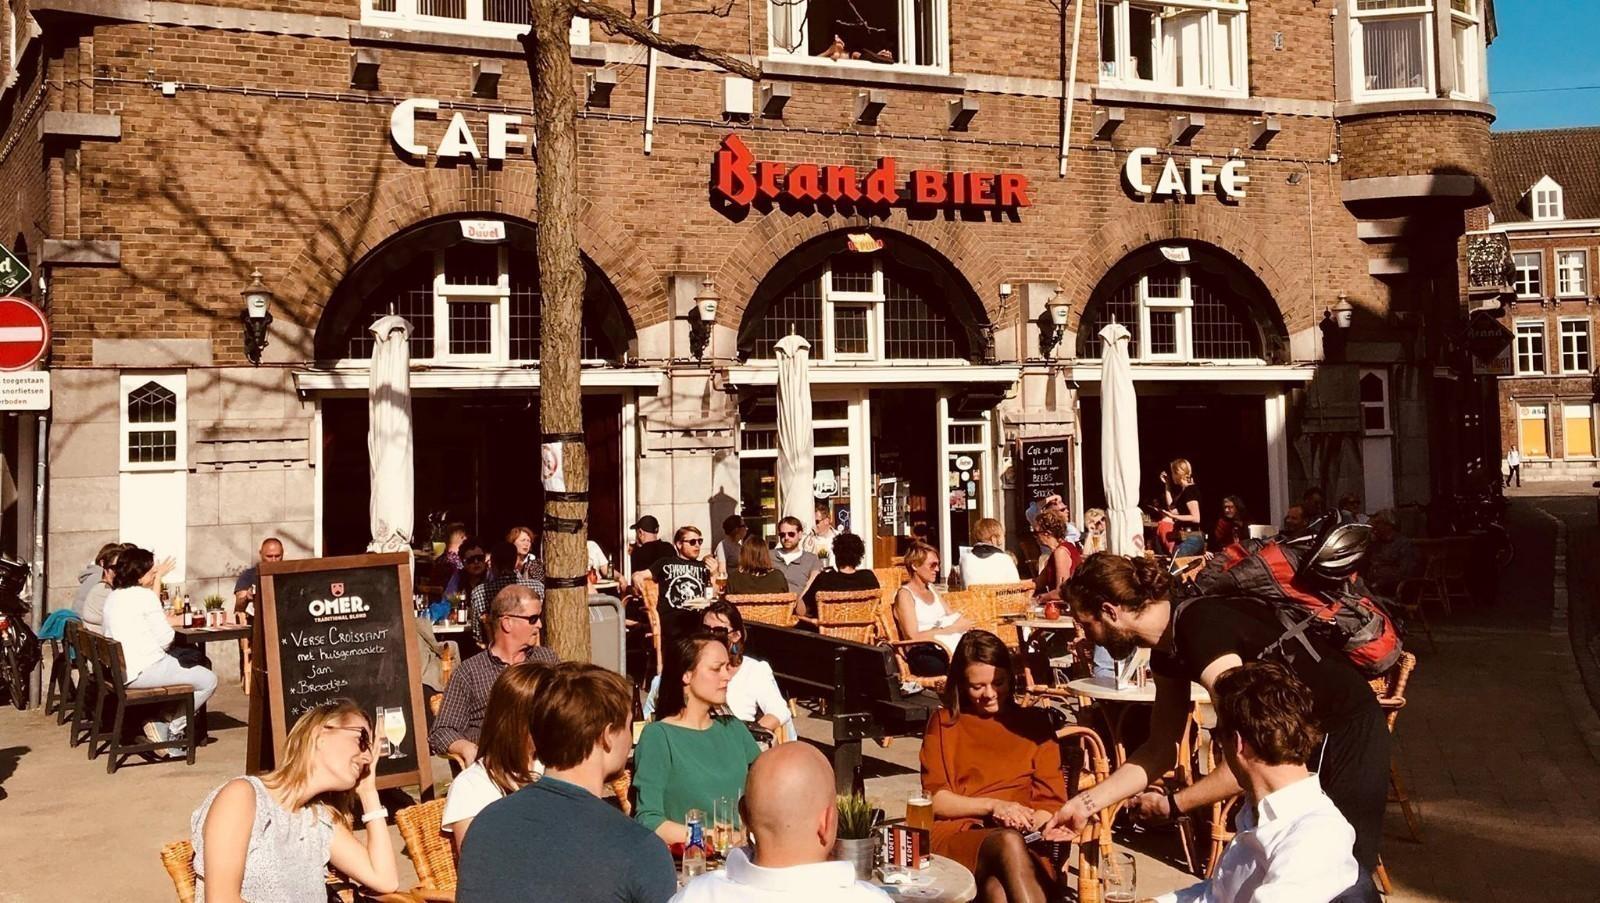 Caf de poort maastricht caf de poort maastricht for Cafe de poort utrecht